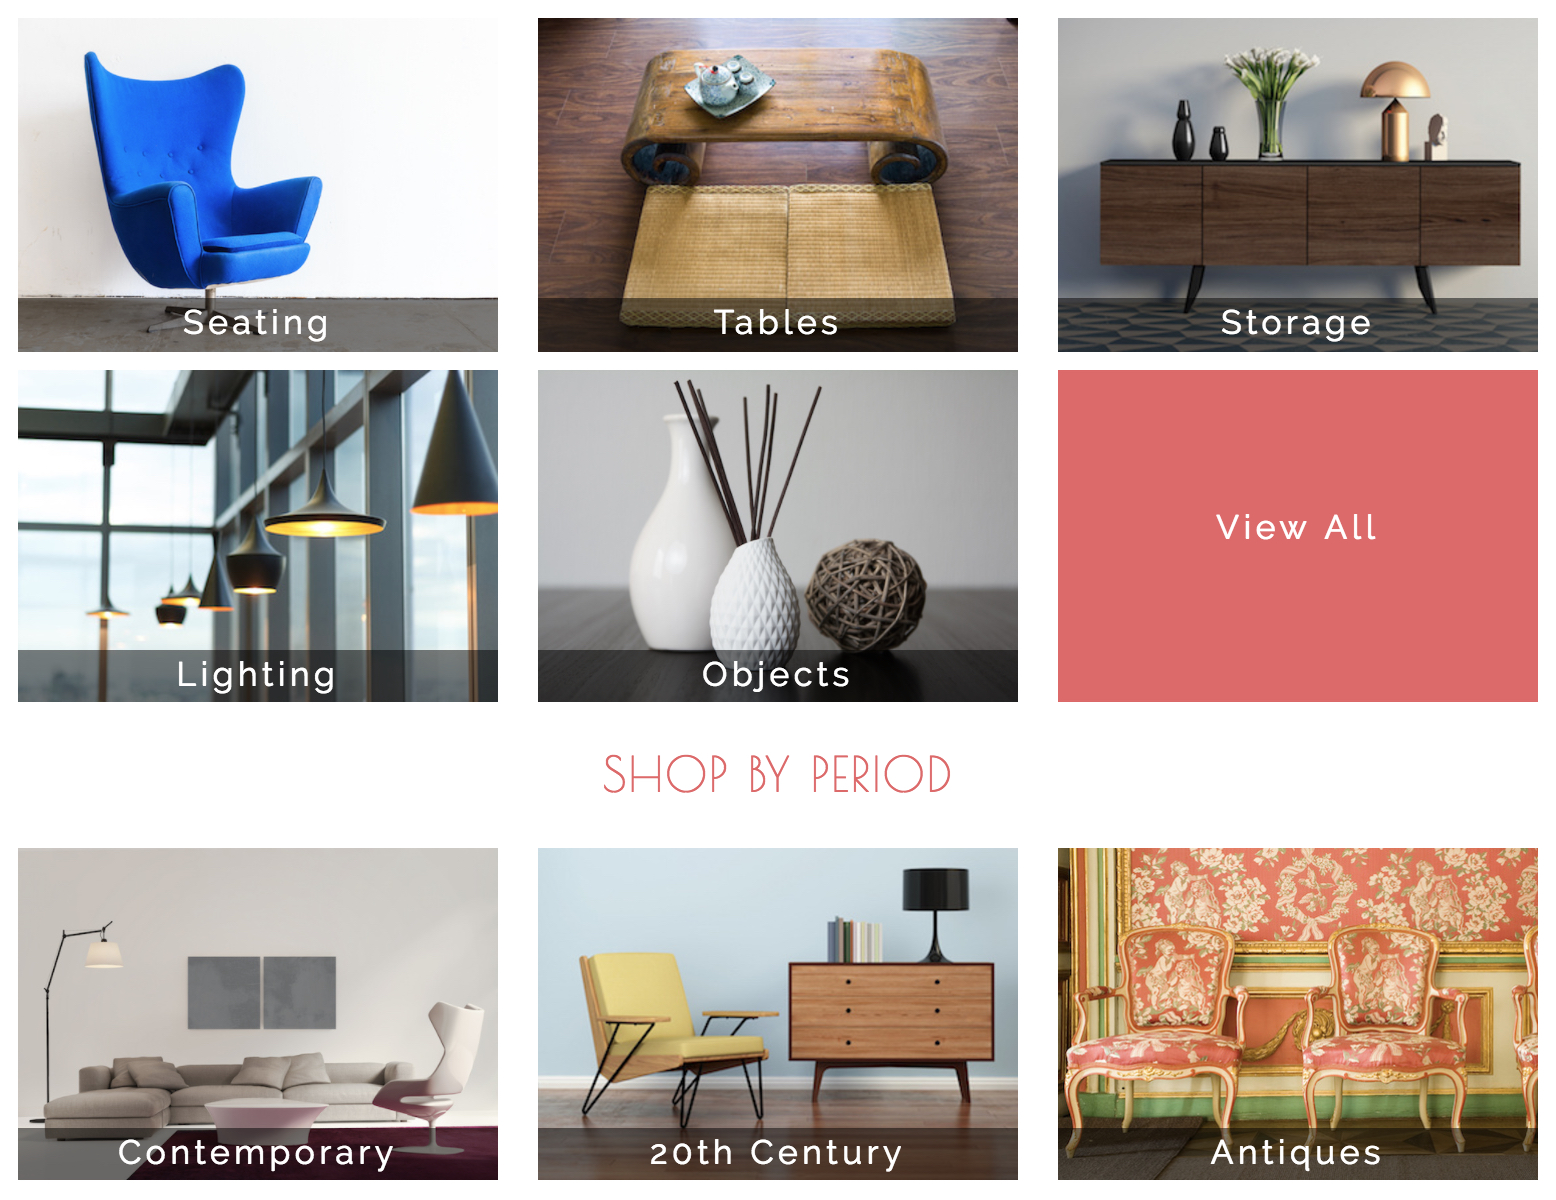 vinterior-luxury-designer-vintage-antique-furniture-2016-11-14-09-43-16